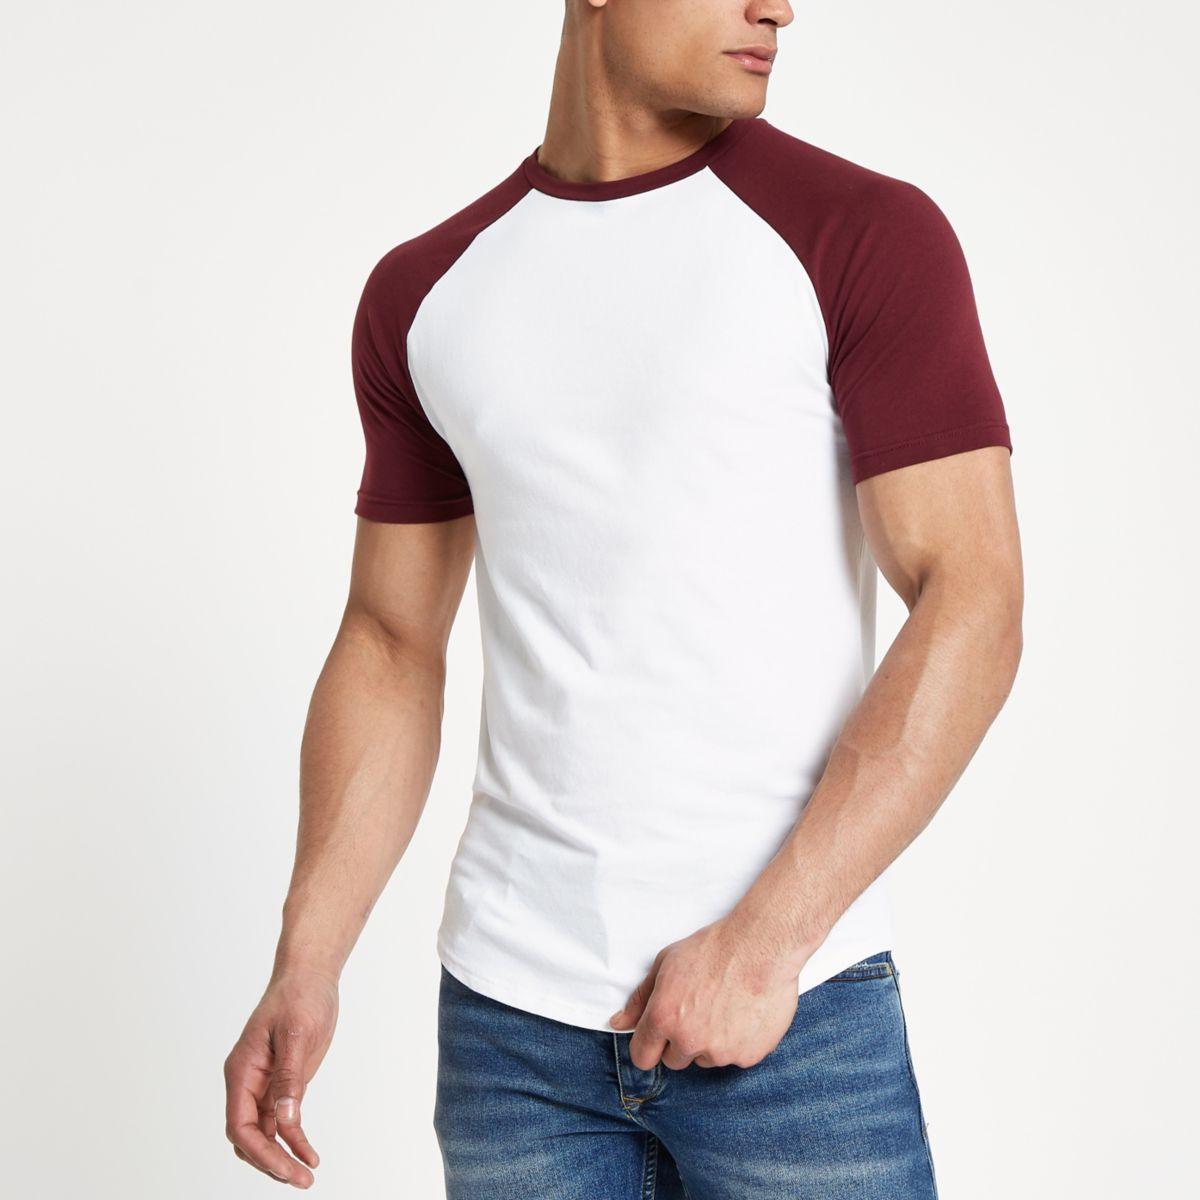 White raglan short sleeve muscle T-shirt